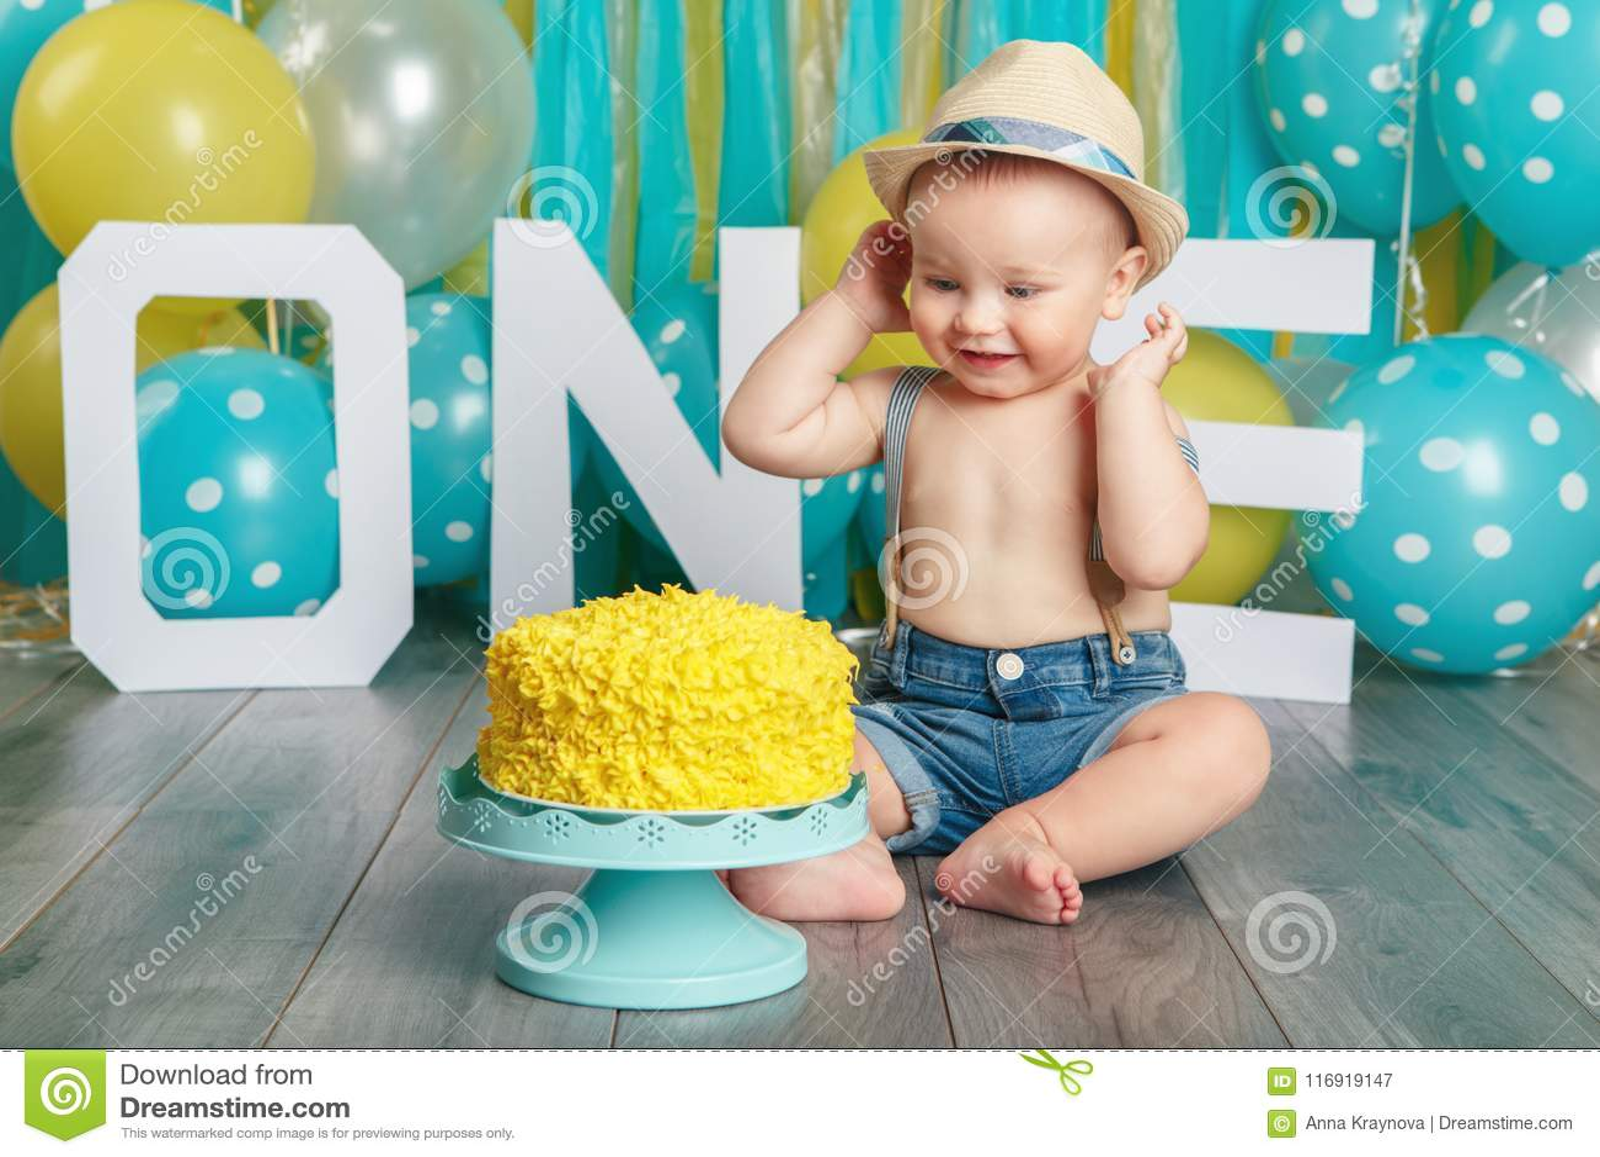 Caucasian Baby Boy Celebrating His First Birthday Cake Smash Stock Image Image Of Infant Laughing 116919147